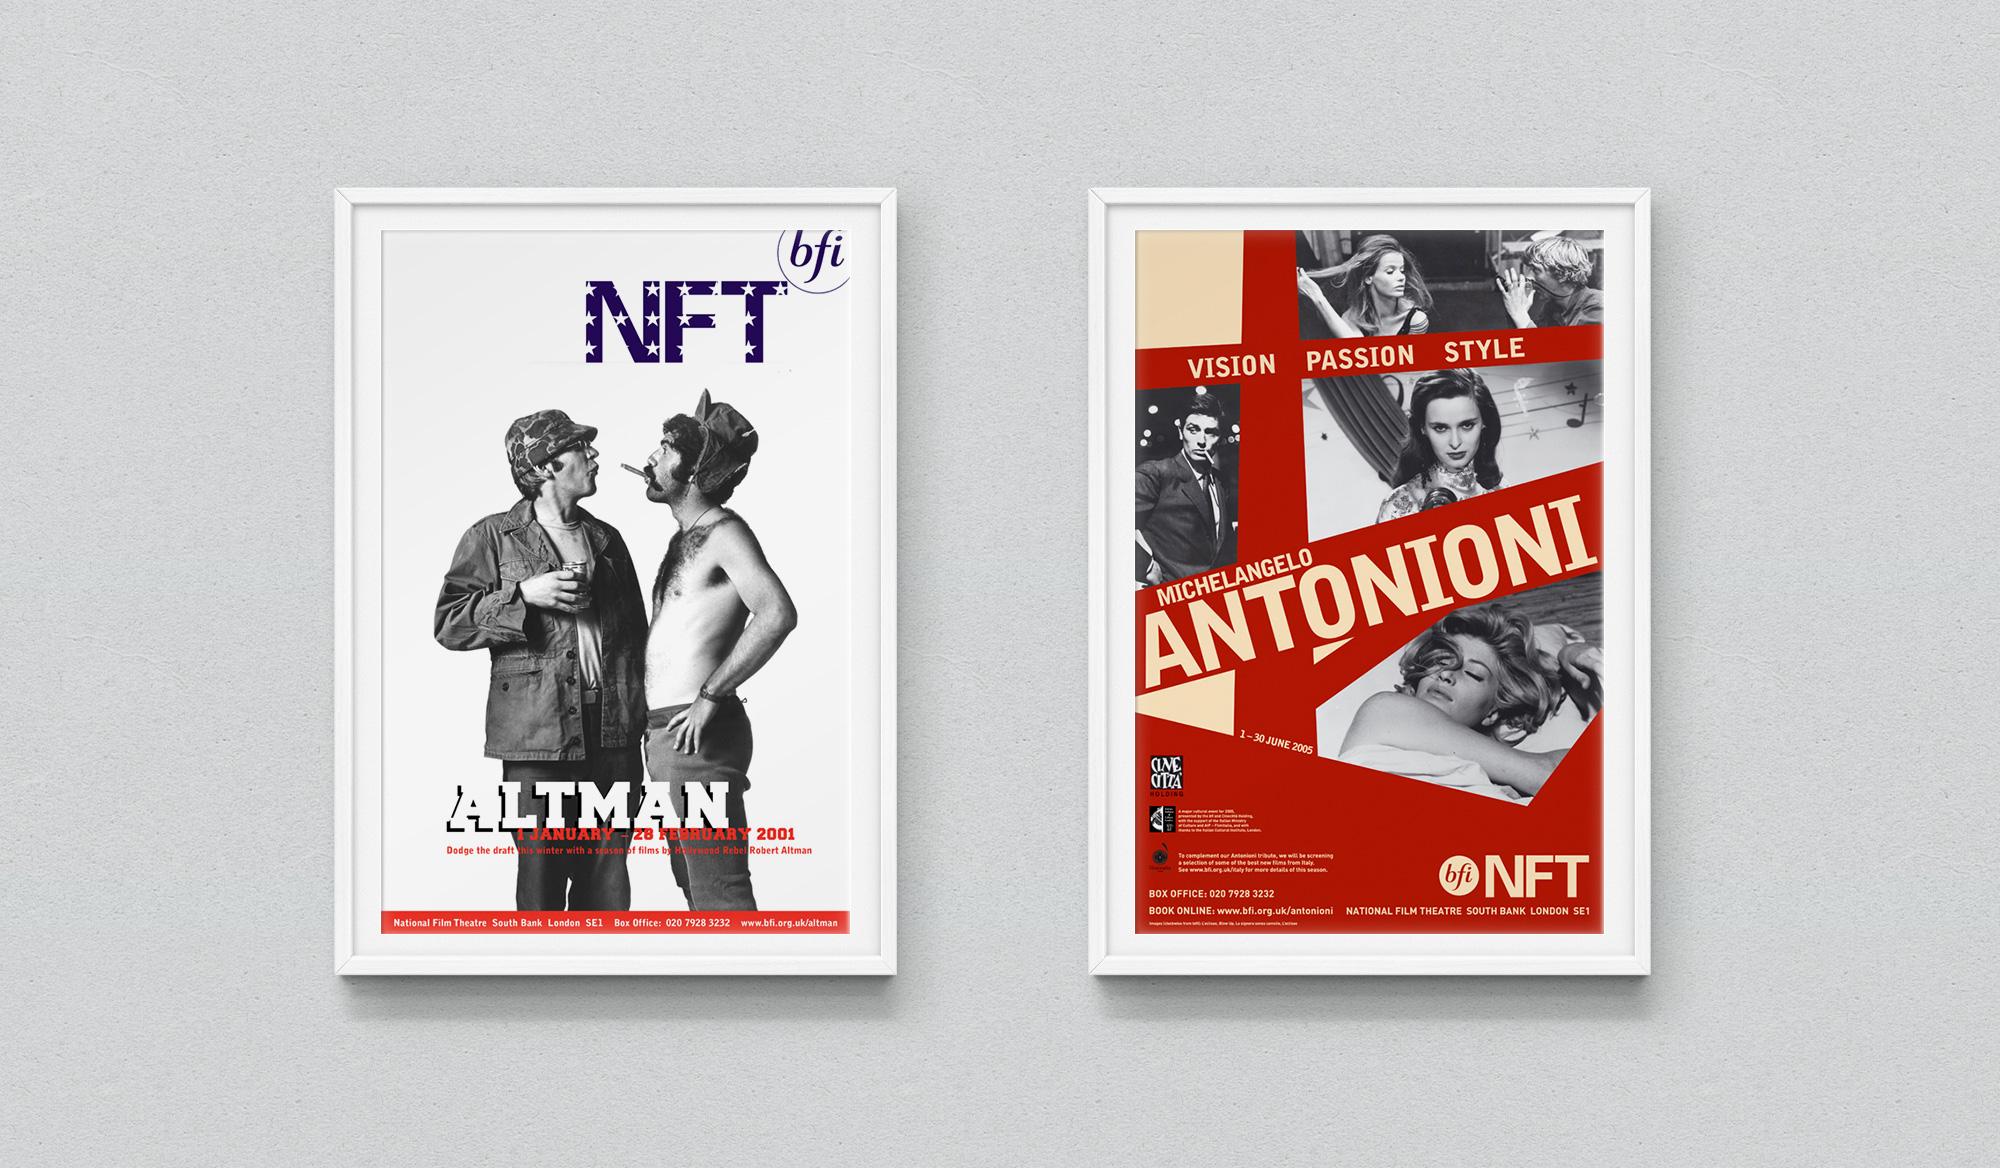 altman-antonioni-posters-background